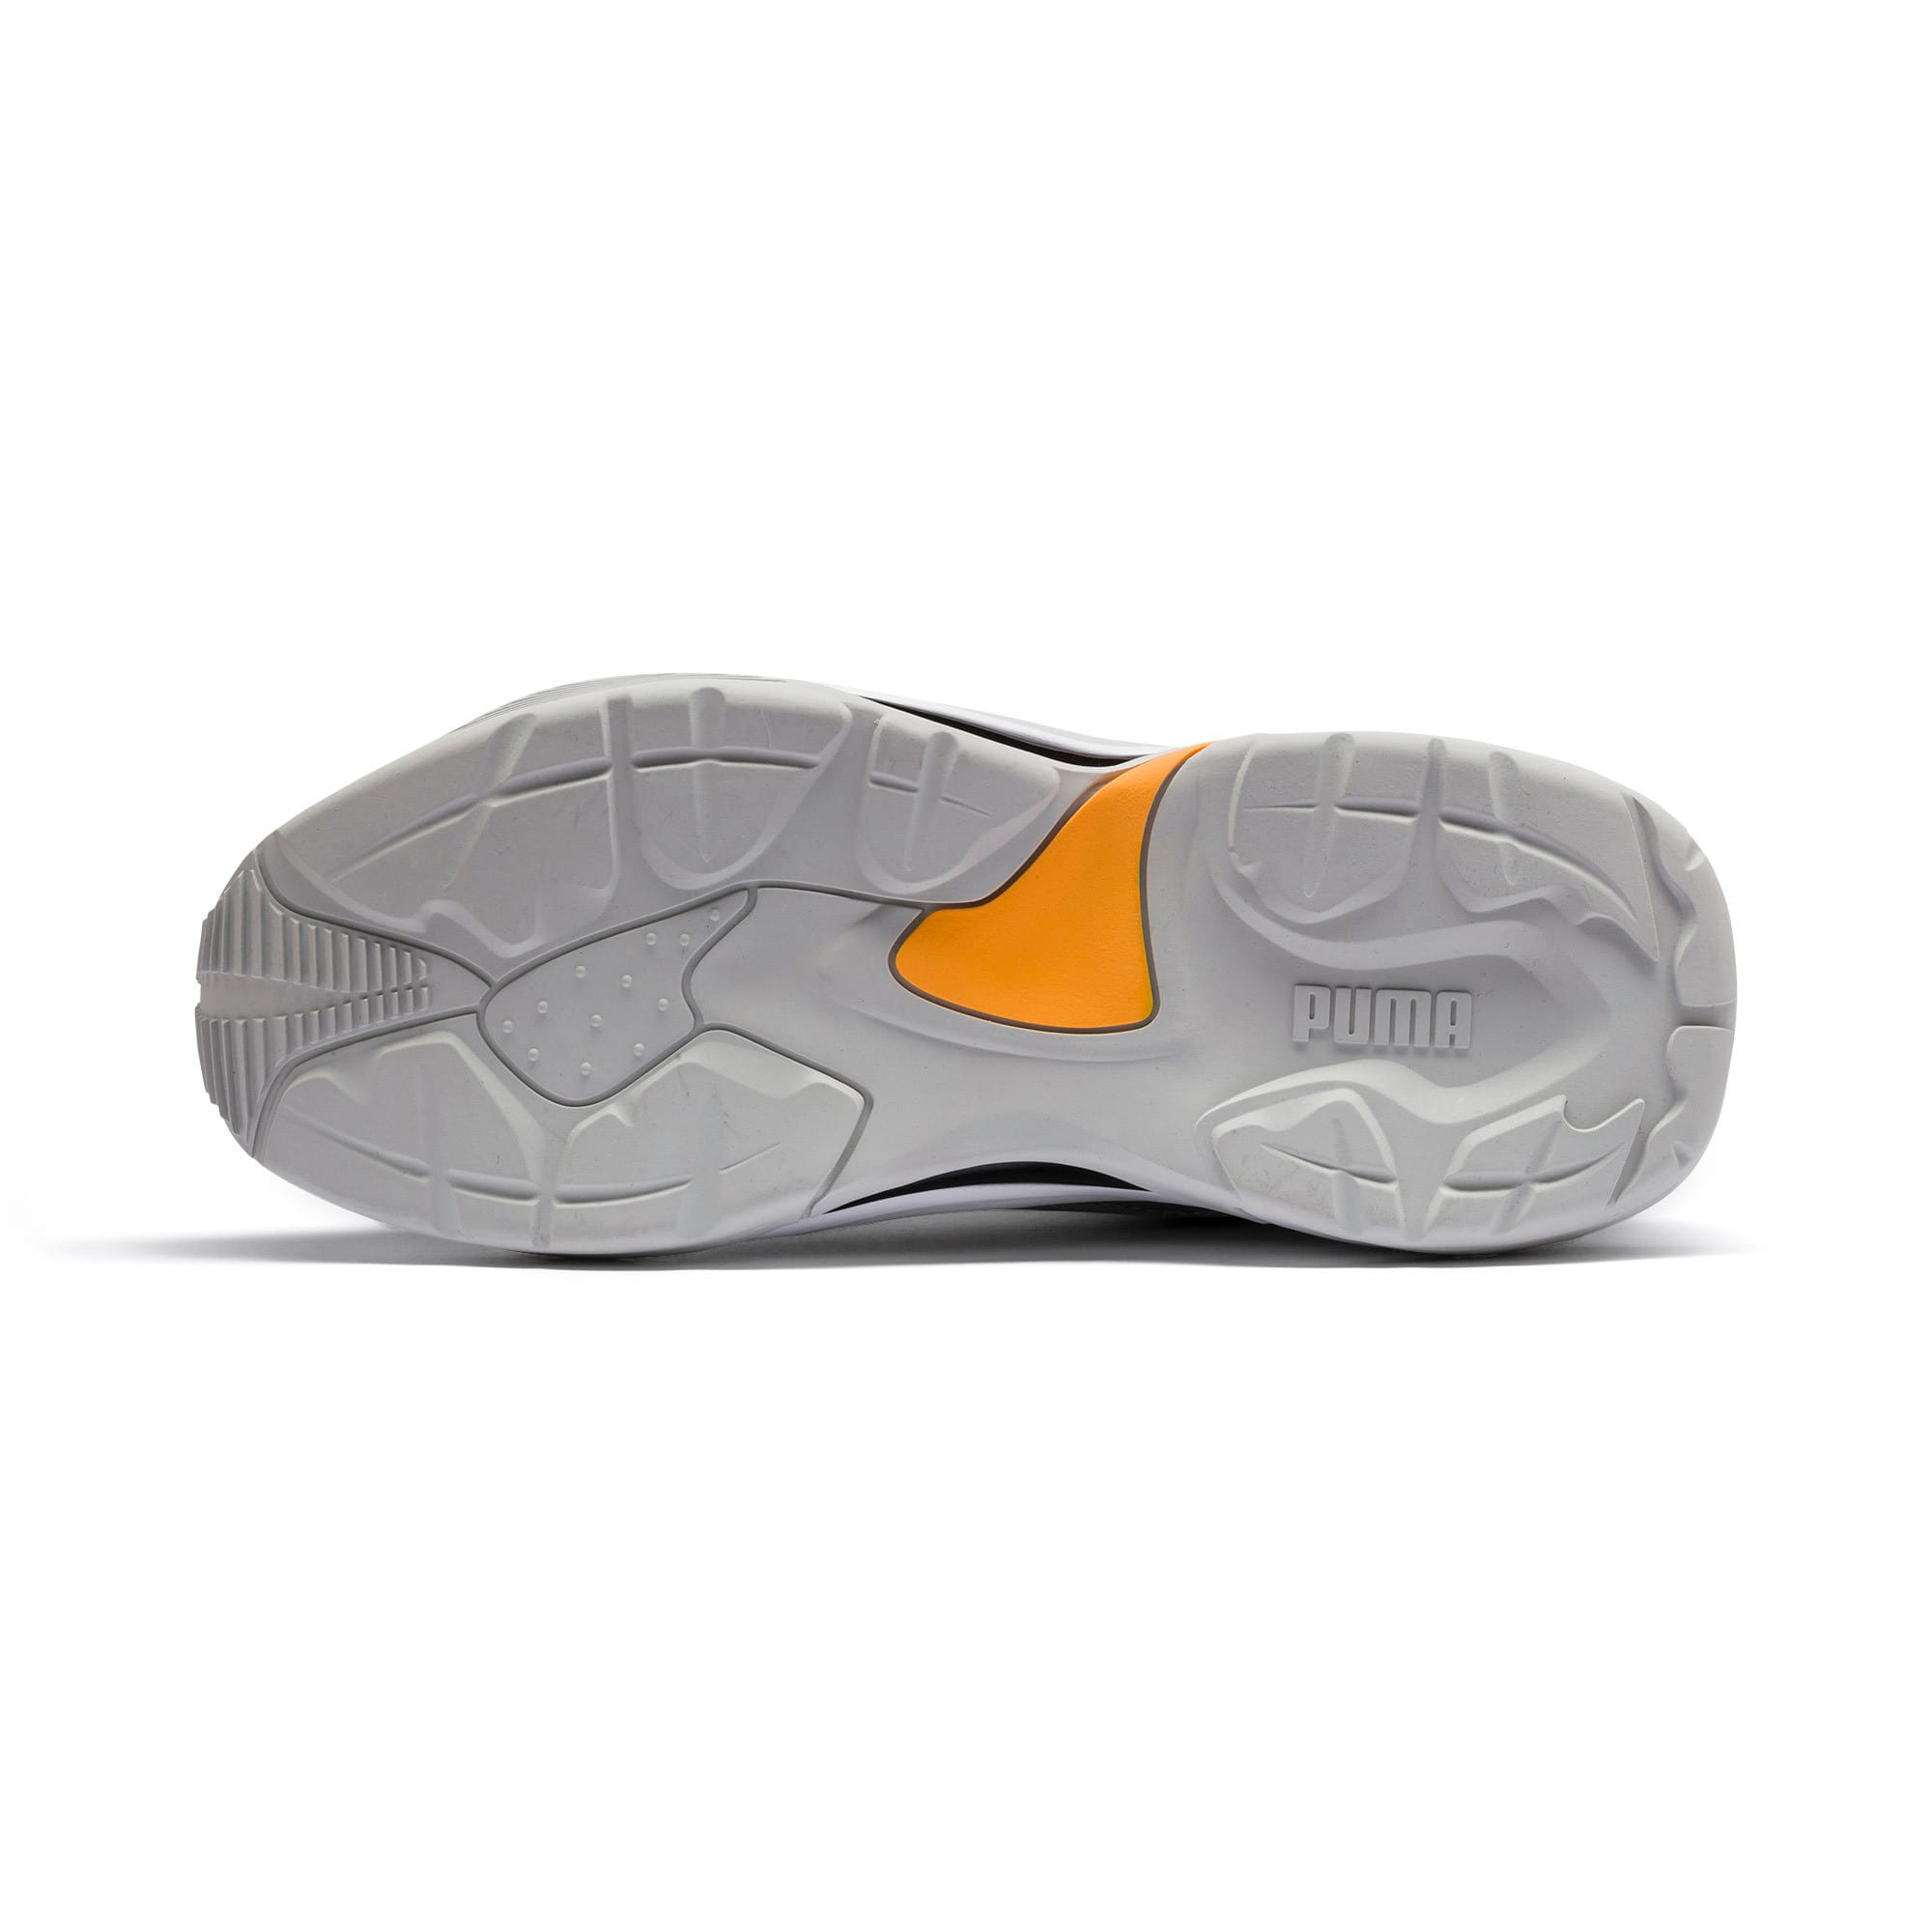 Thumbnail 4 of Thunder Spectra Sneakers, Glacier Gray-Indigo Bunting, medium